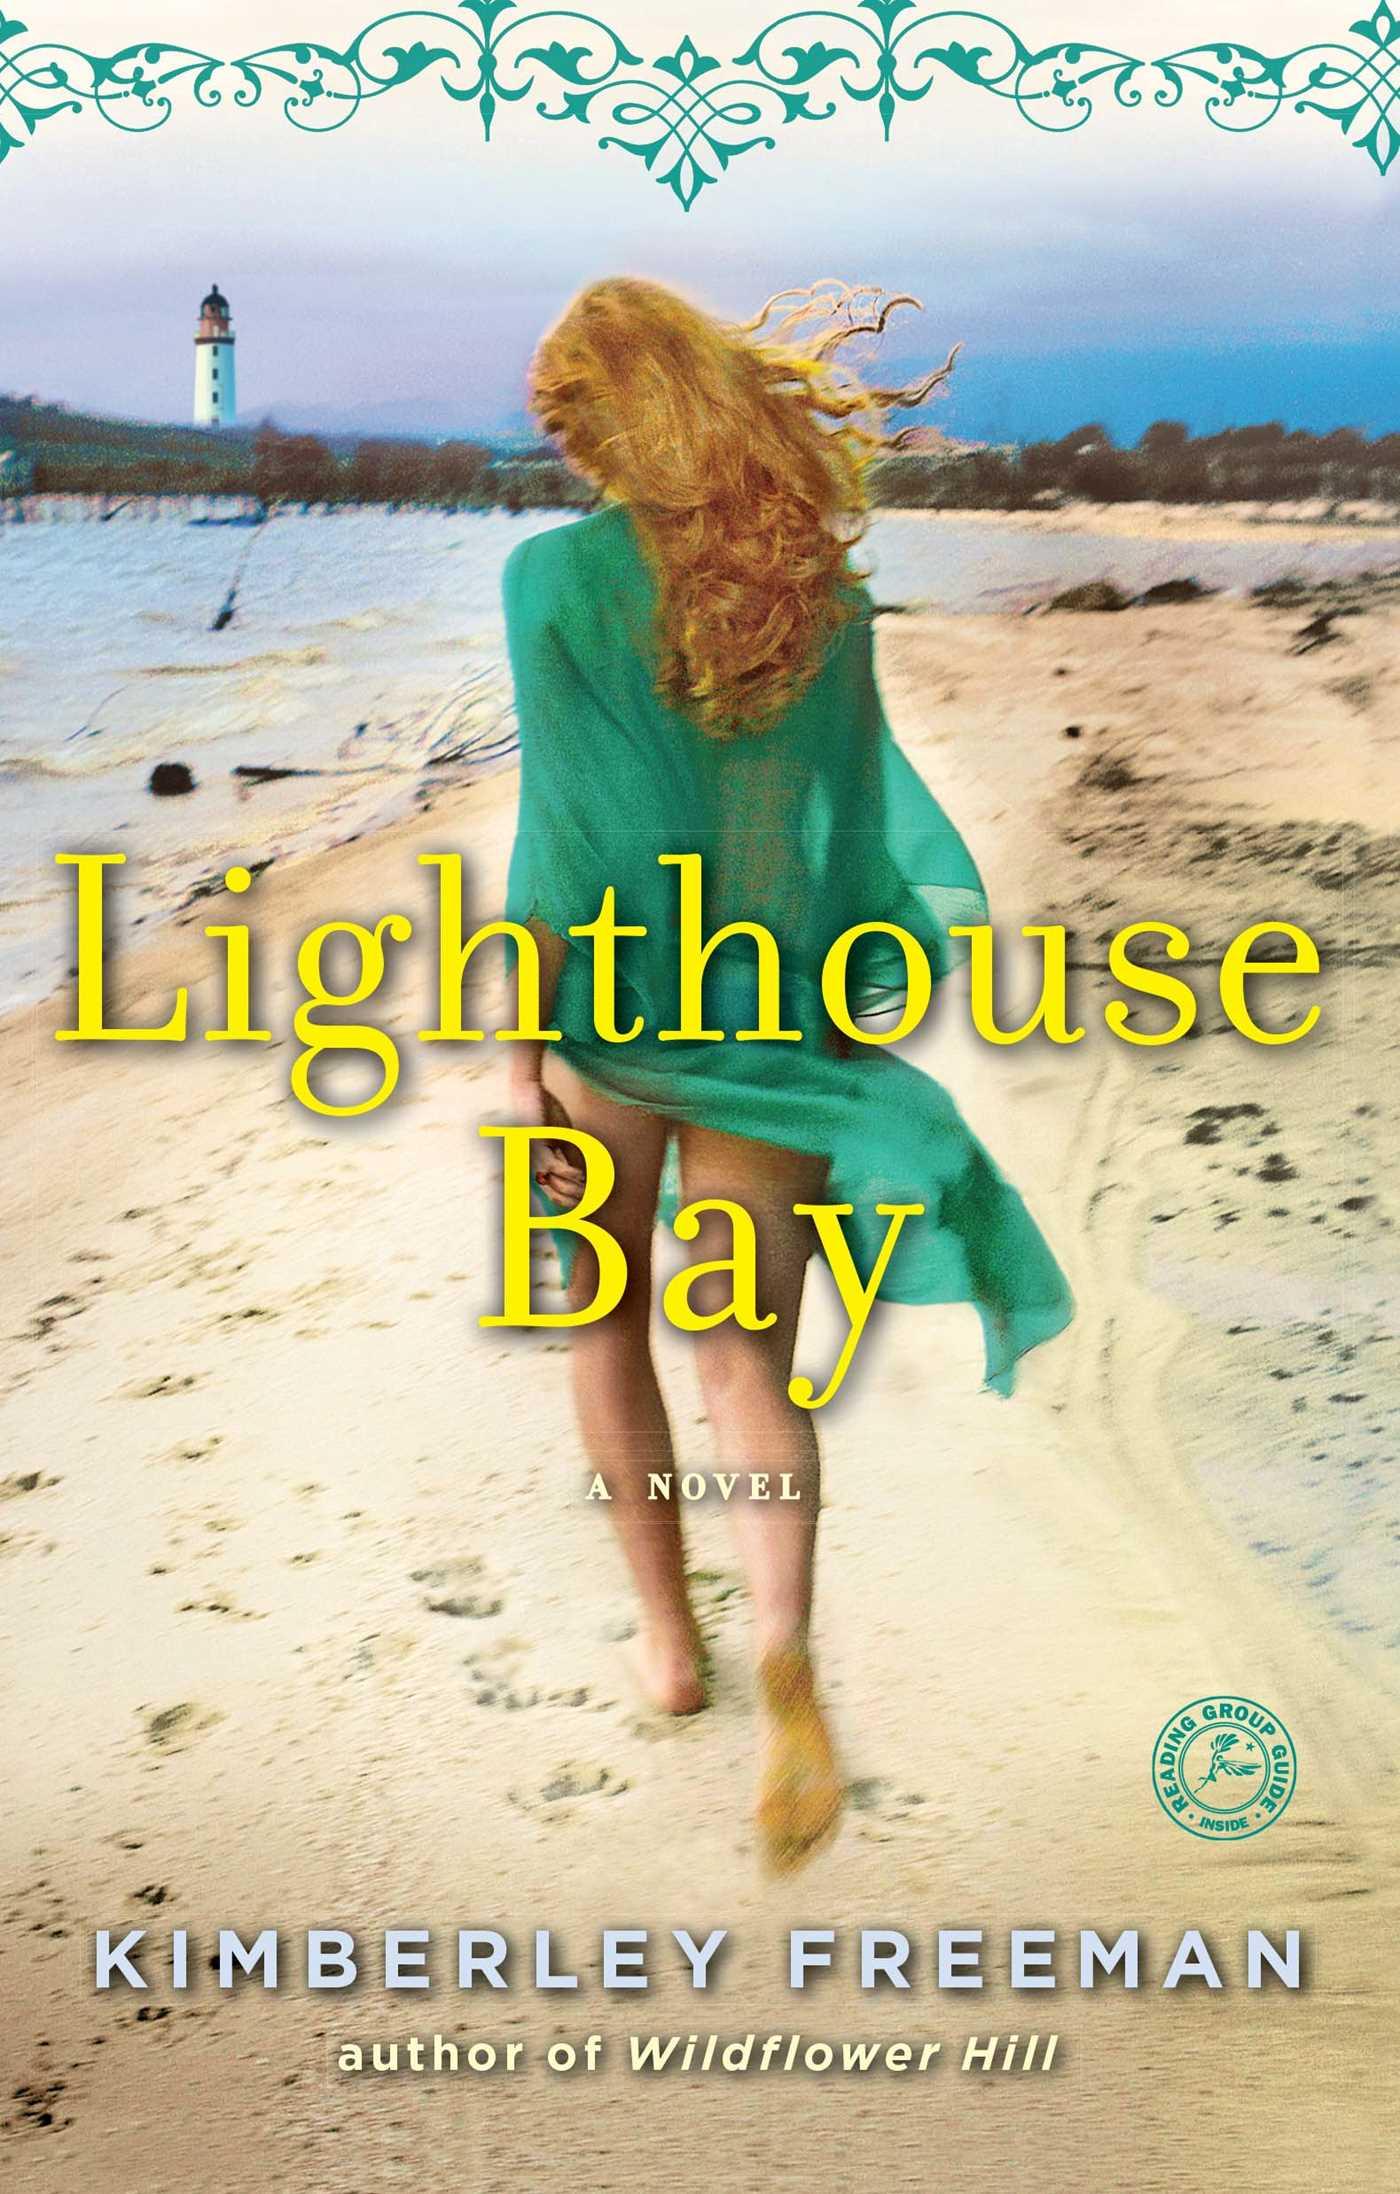 Lighthouse bay 9781451672794 hr